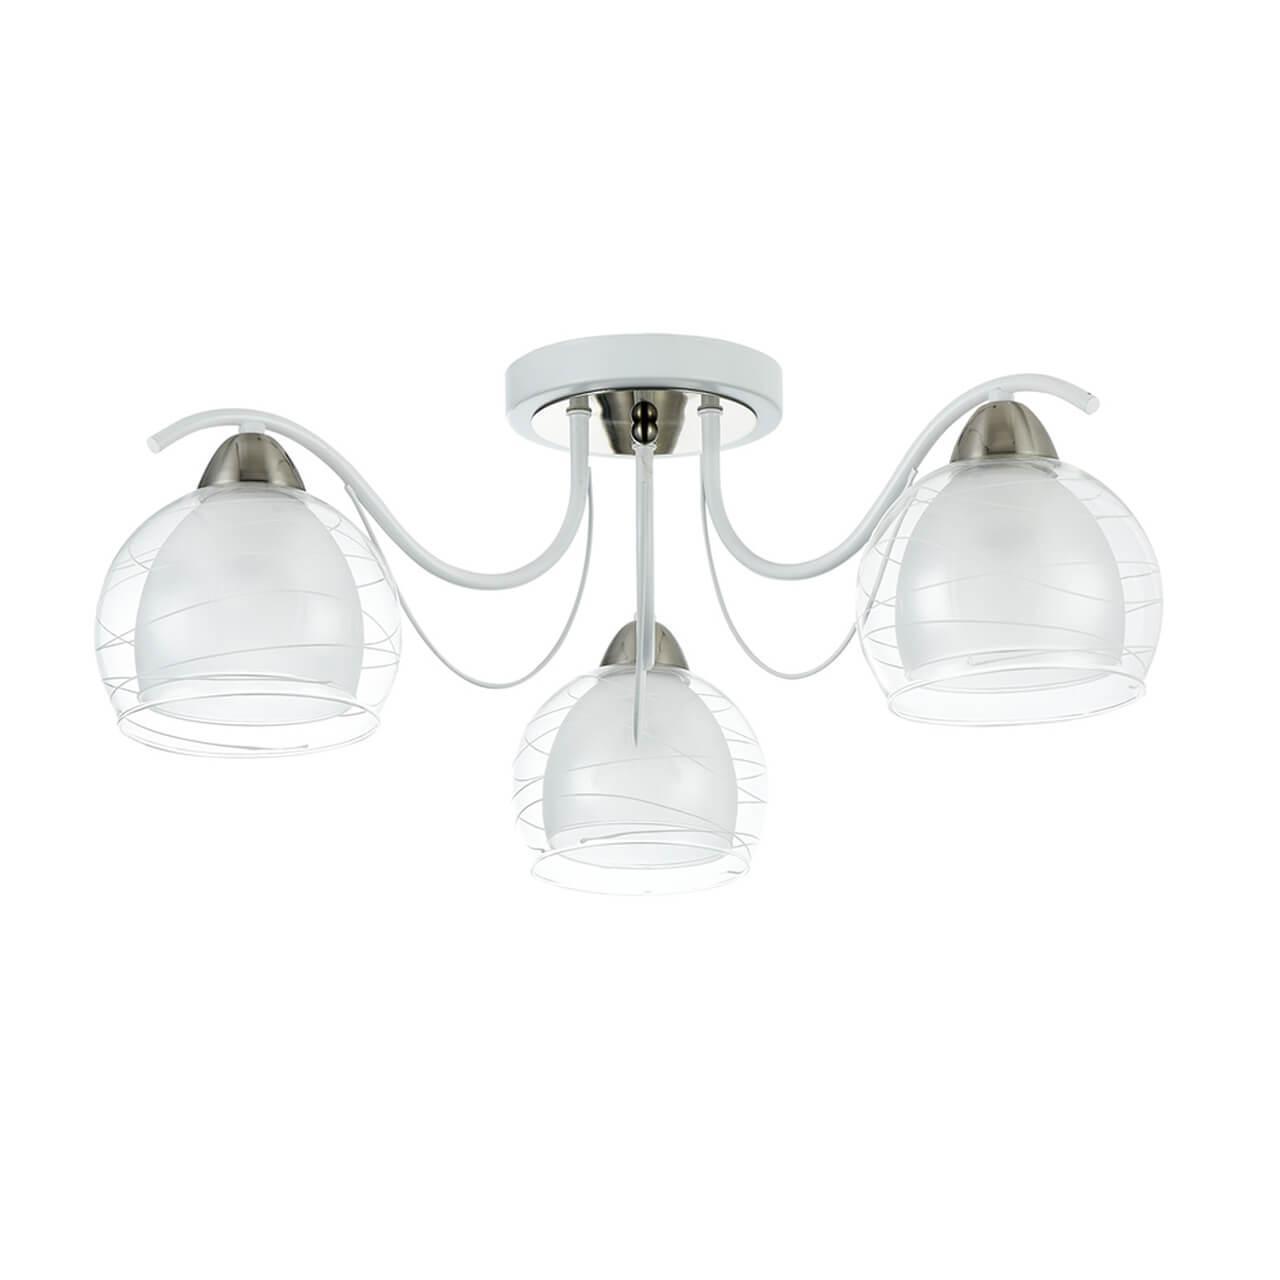 Потолочный светильник Freya FR5052-CL-03-W, E27, 60 Вт люстра freya freya fr5052 cl 03 w